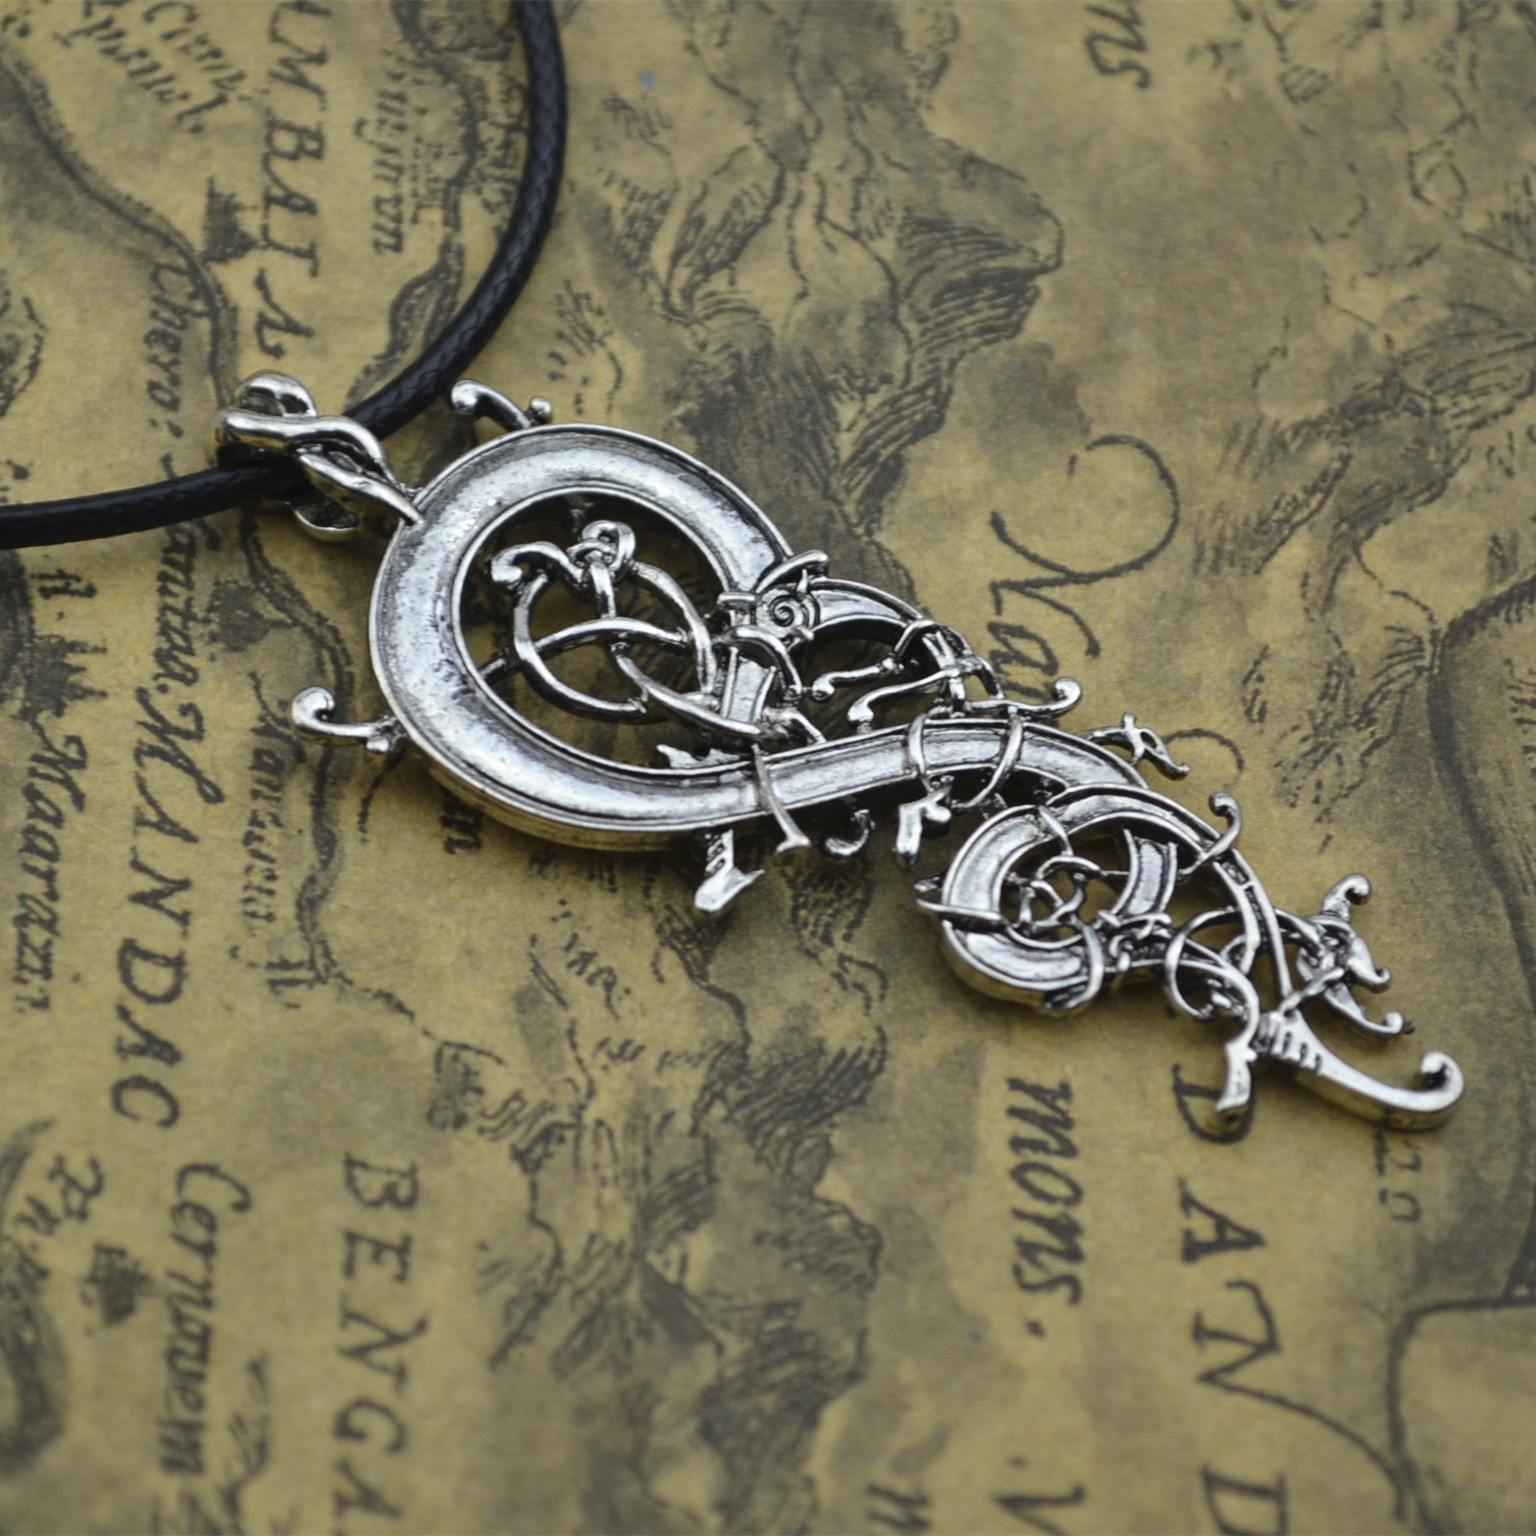 Dependable Men Viking Dragon Sekira Legendary Aegishjalmur Amulet Nordic Talisman Pegan Pendant Necklace Silver Chain Jewelry & Accessories Chain Necklaces